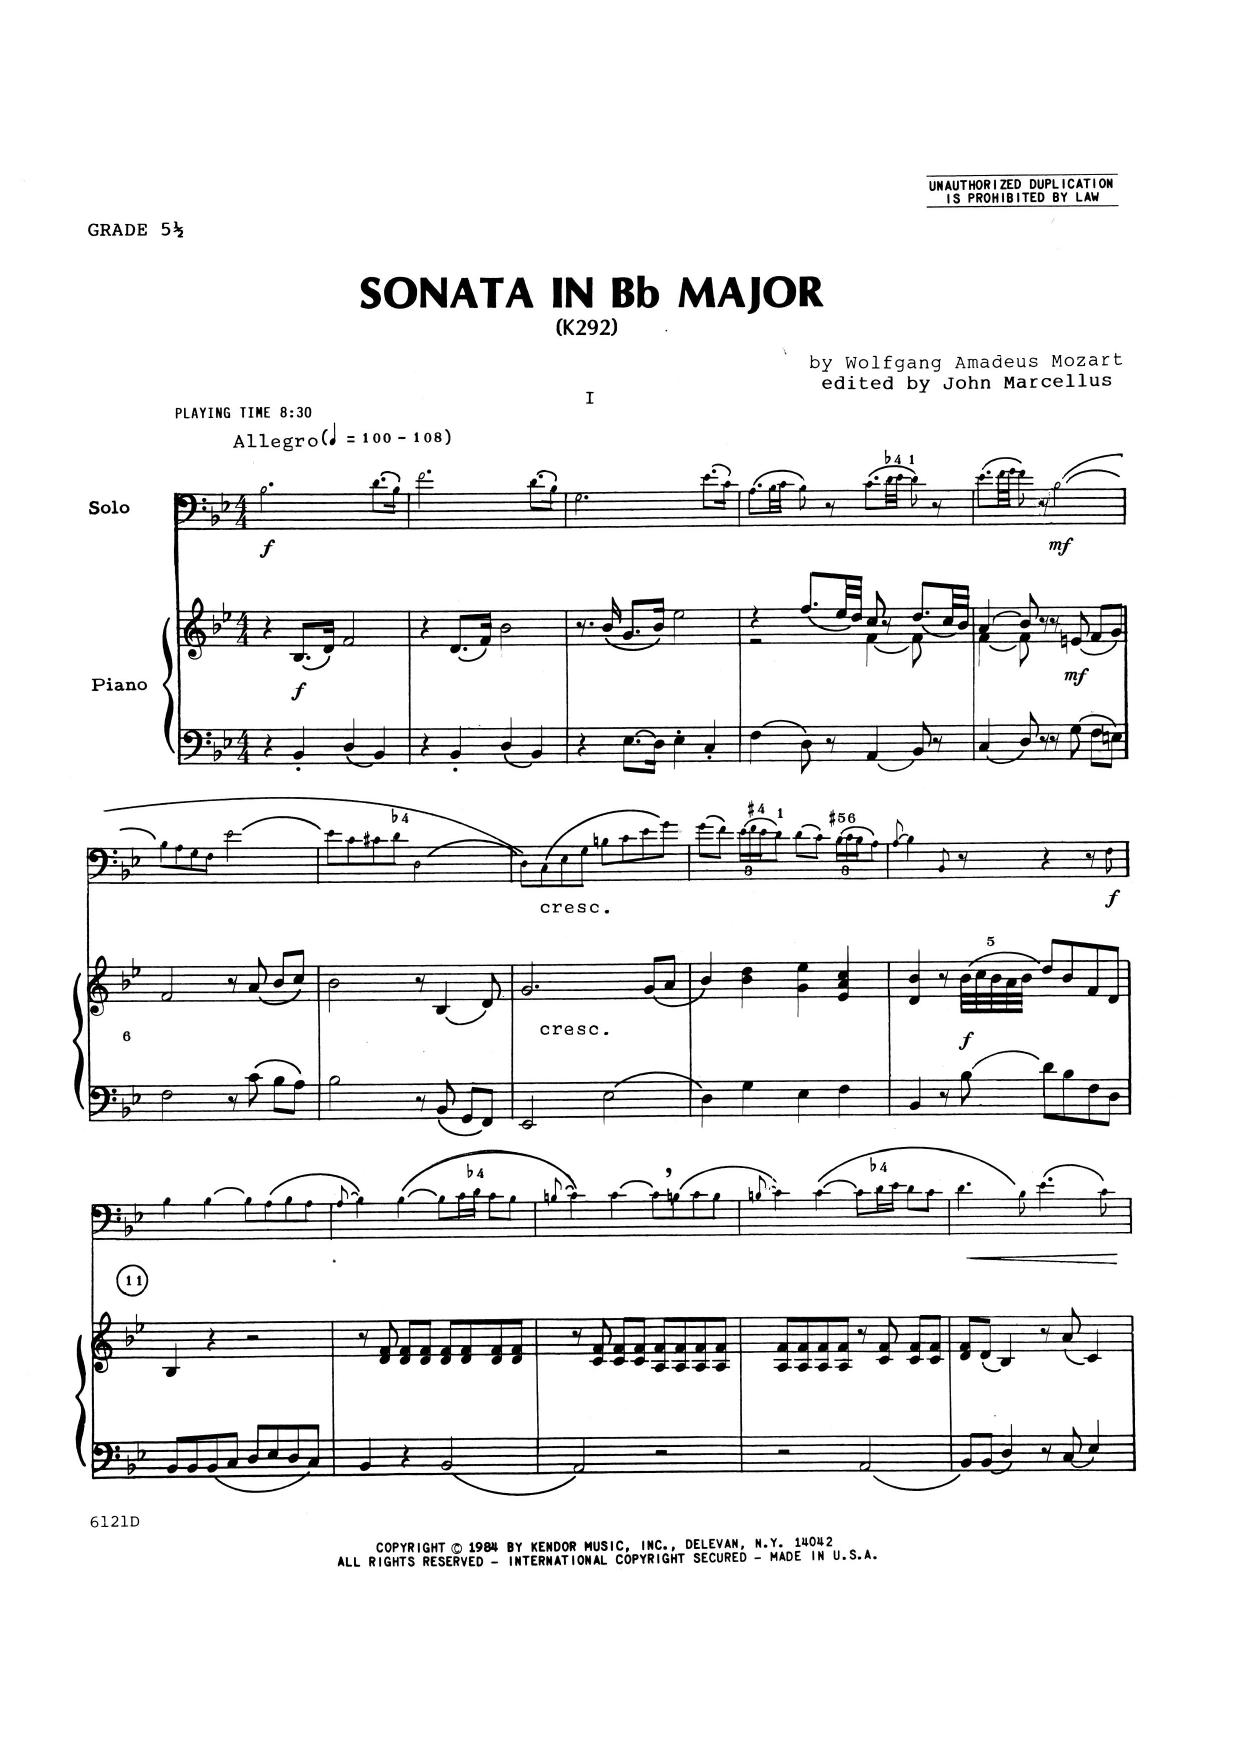 John Marcellus Sonata In Bb Major (K292) - Piano Accompaniment sheet music notes and chords. Download Printable PDF.